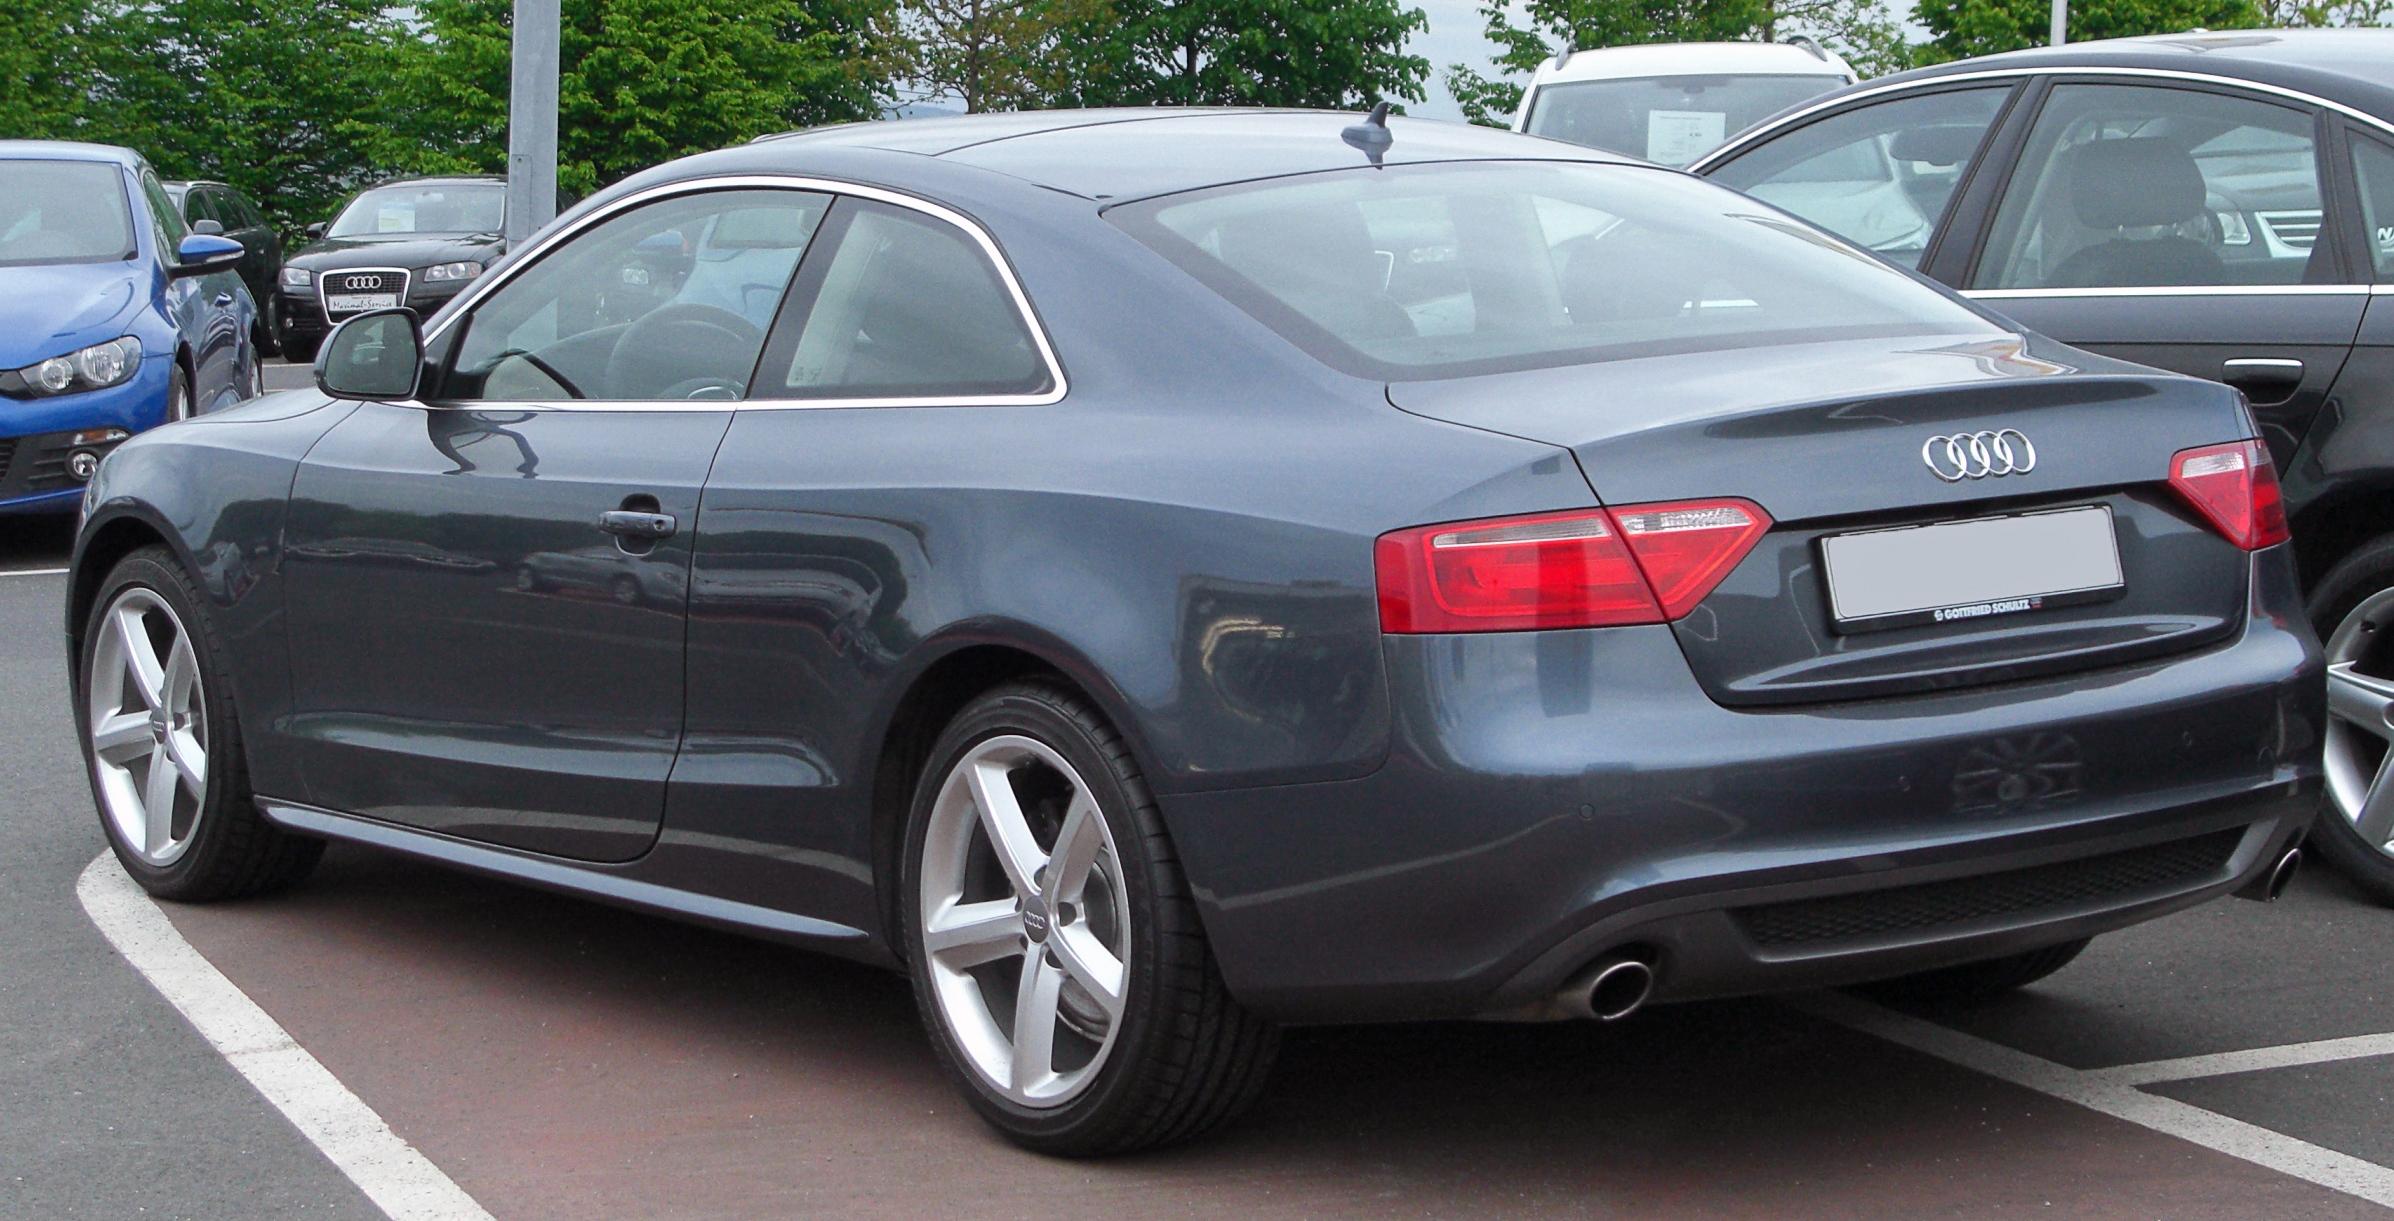 Kelebihan Audi A5 3.2 Fsi Harga